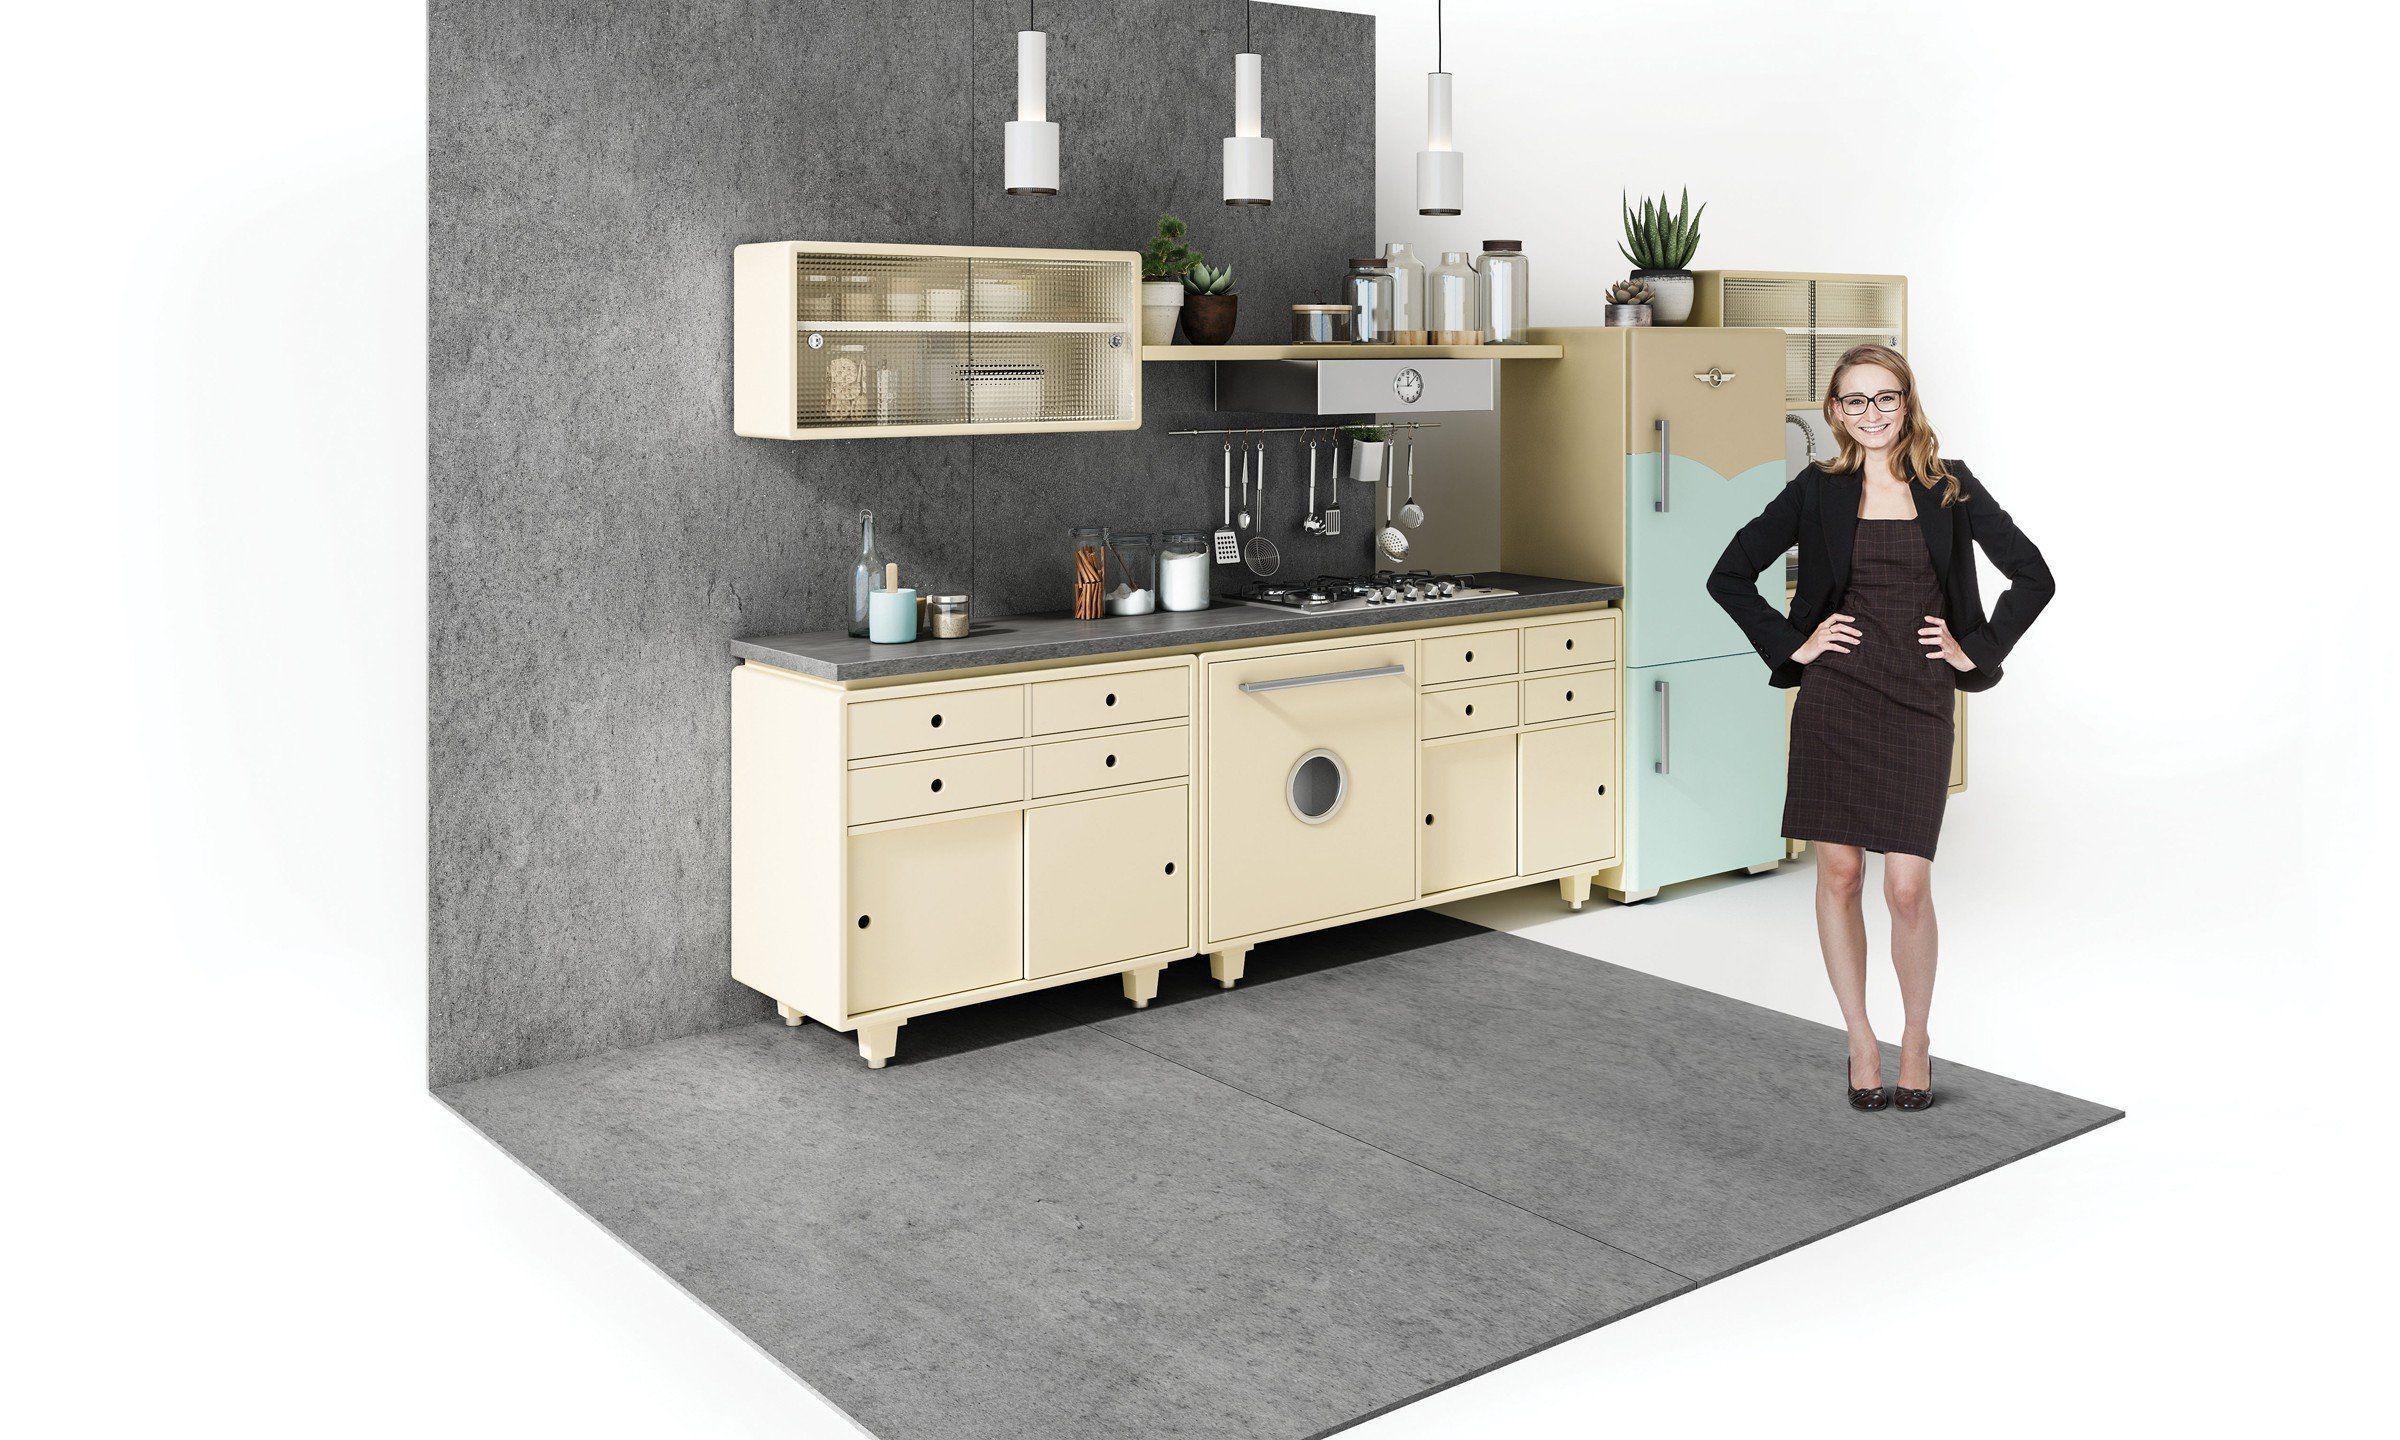 grey kitchen countertops swags 陶土厨房台面 厨房 黑色 灰色 maximus basaltina stone rak ceramics